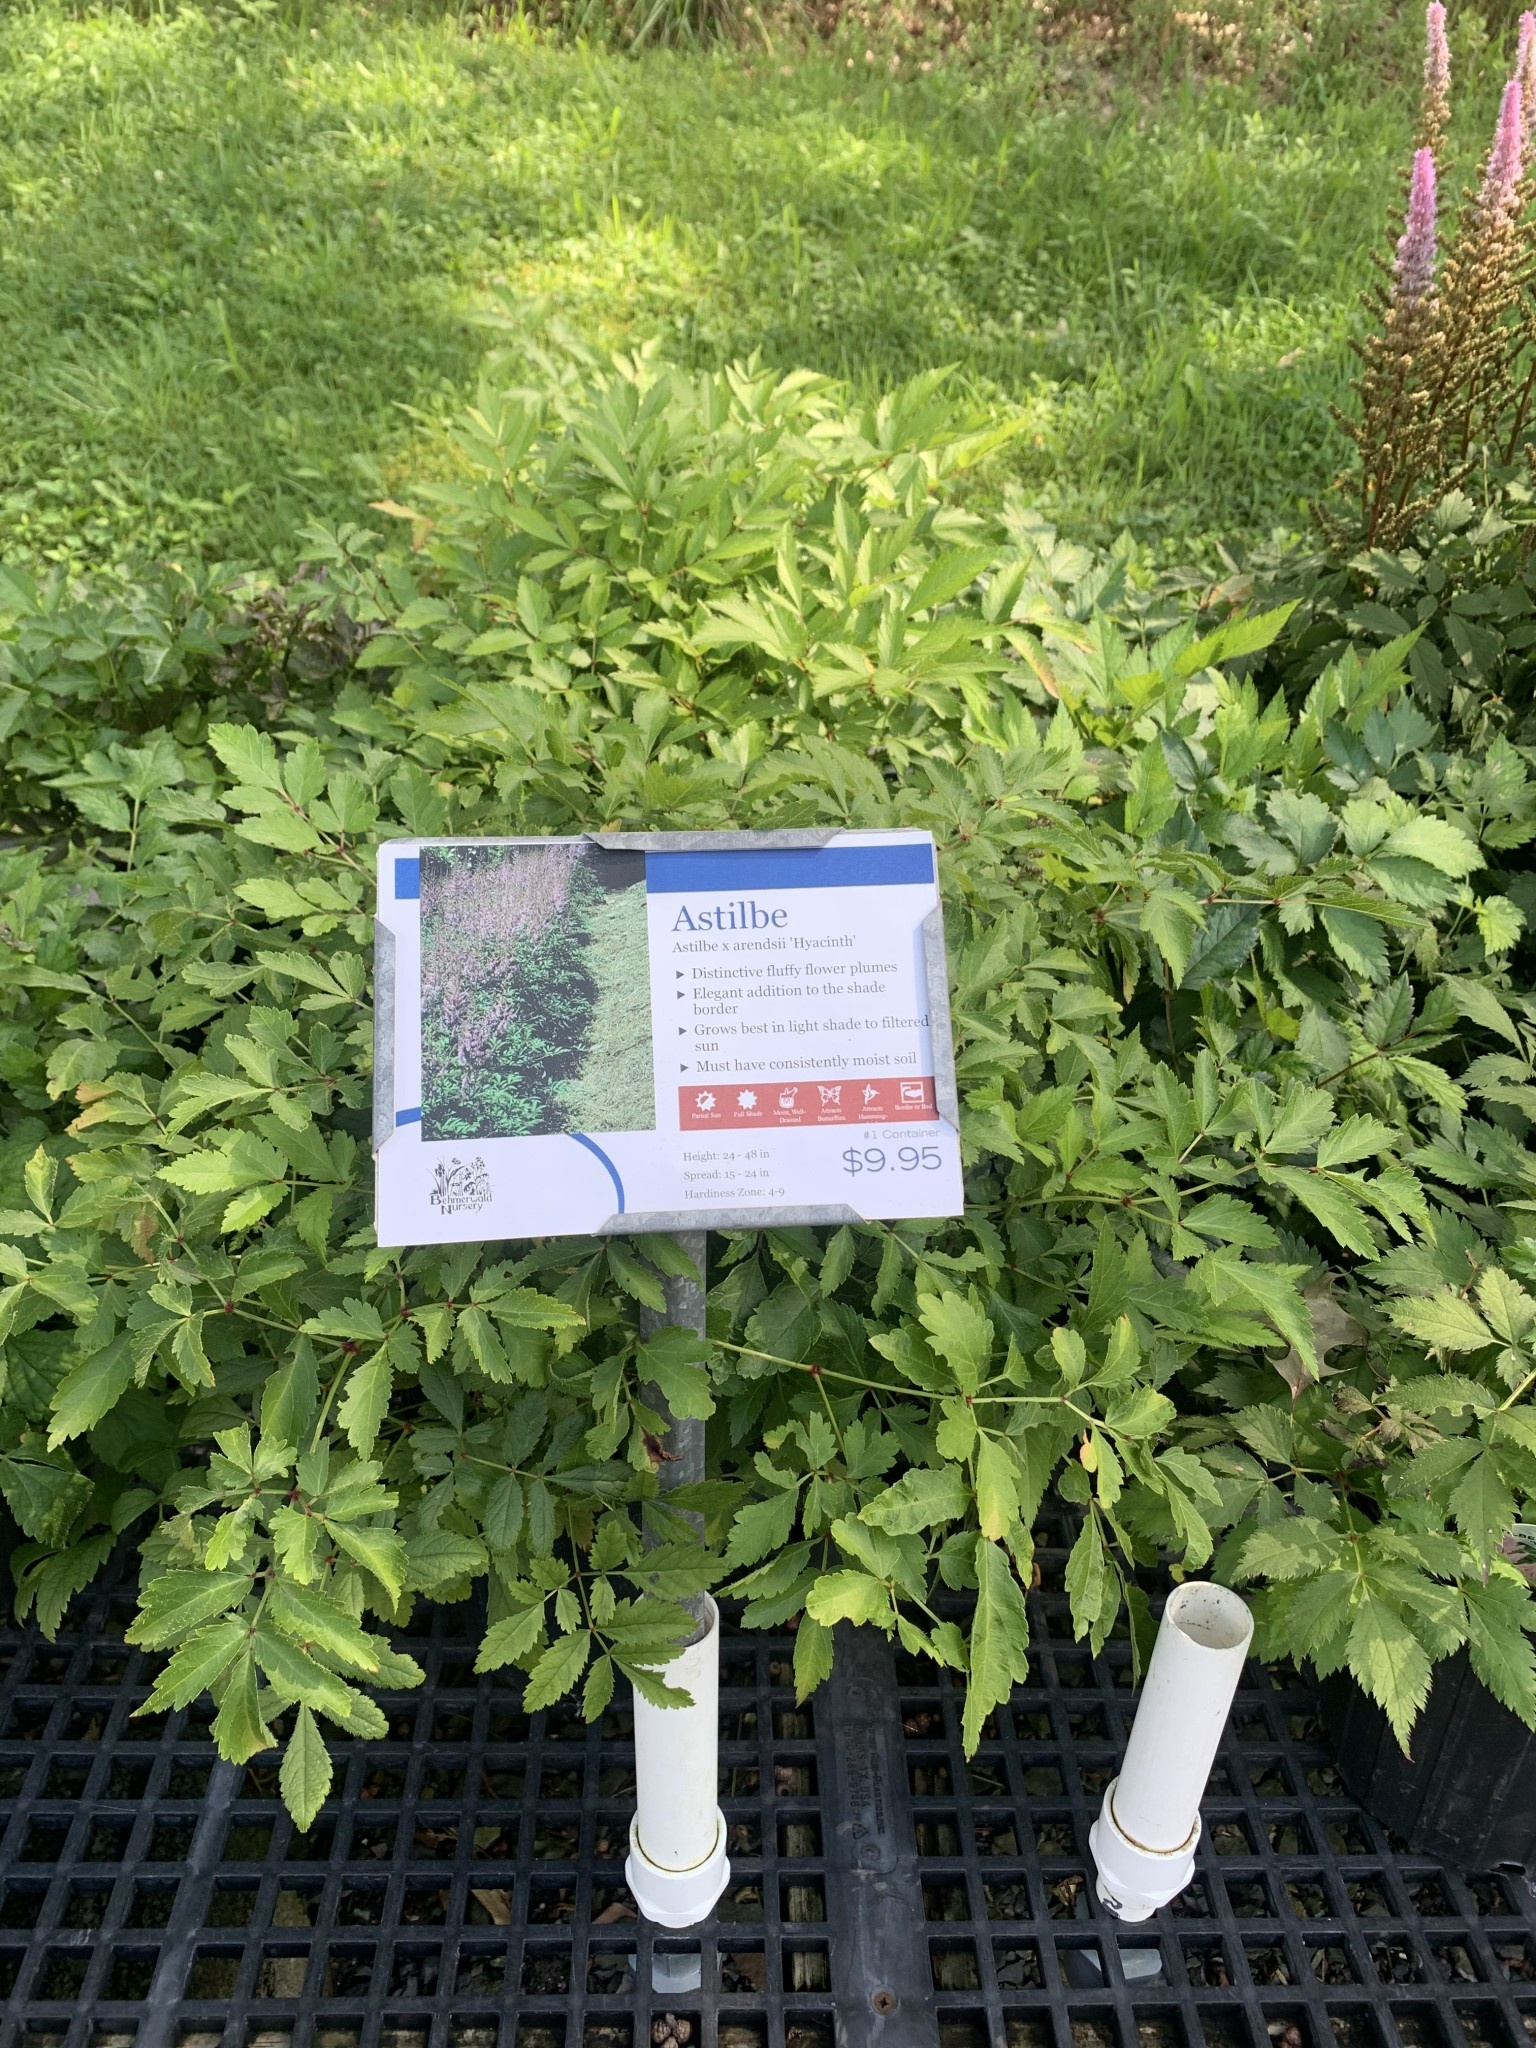 Astilbe a. Hyacinth, False Spirea #1